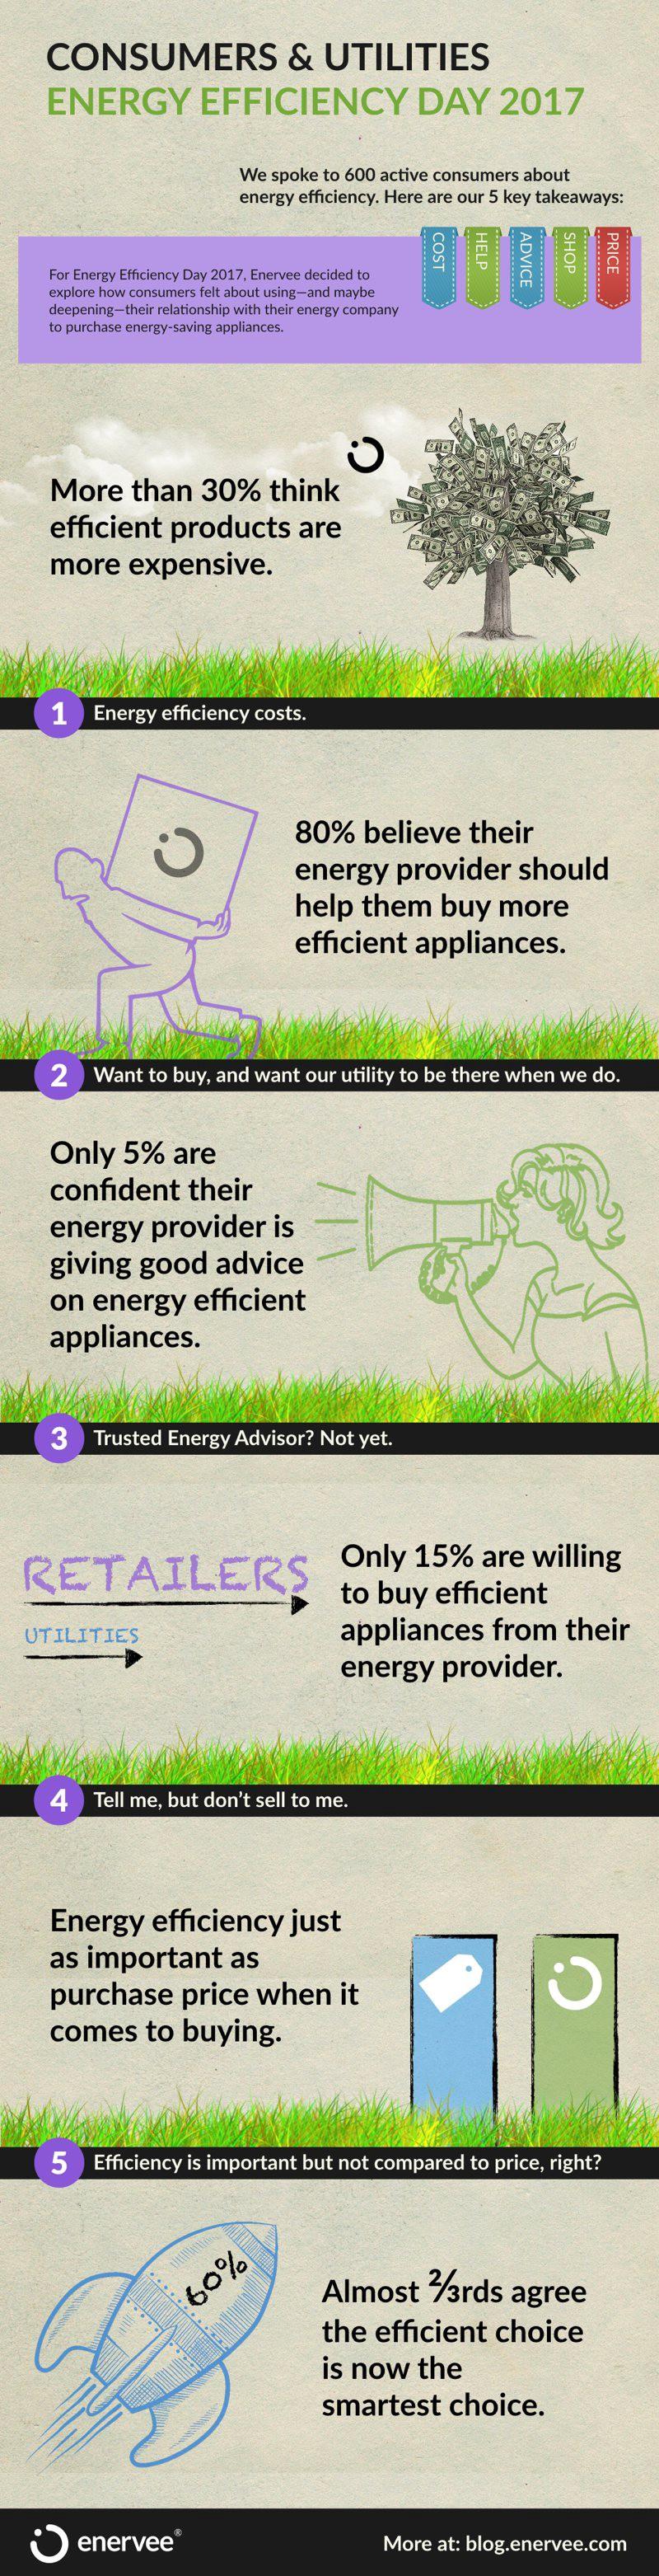 Consumer relationships